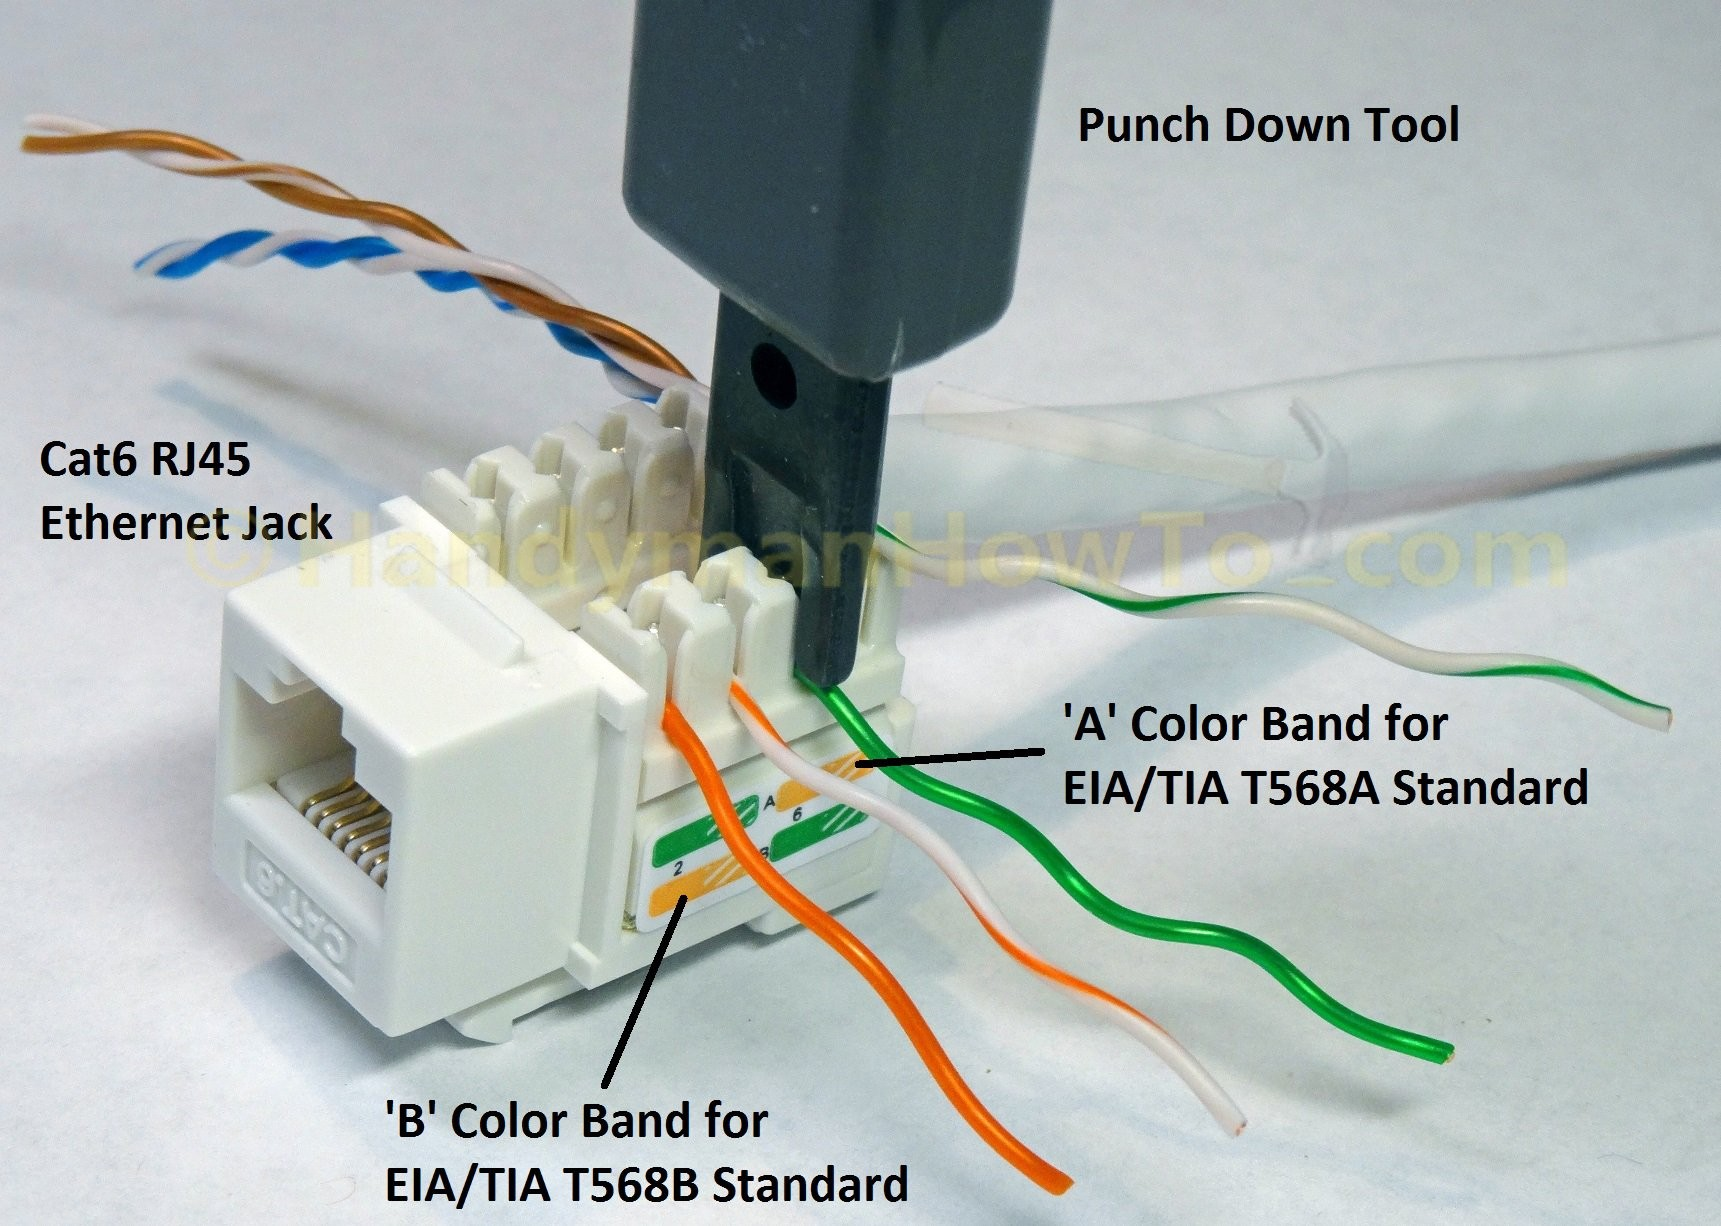 cat 5 wiring diagram wall jack my wiring diagram rh detoxicrecenze com Ethernet Wall Jack cat 5 wiring diagram wall jack a or b